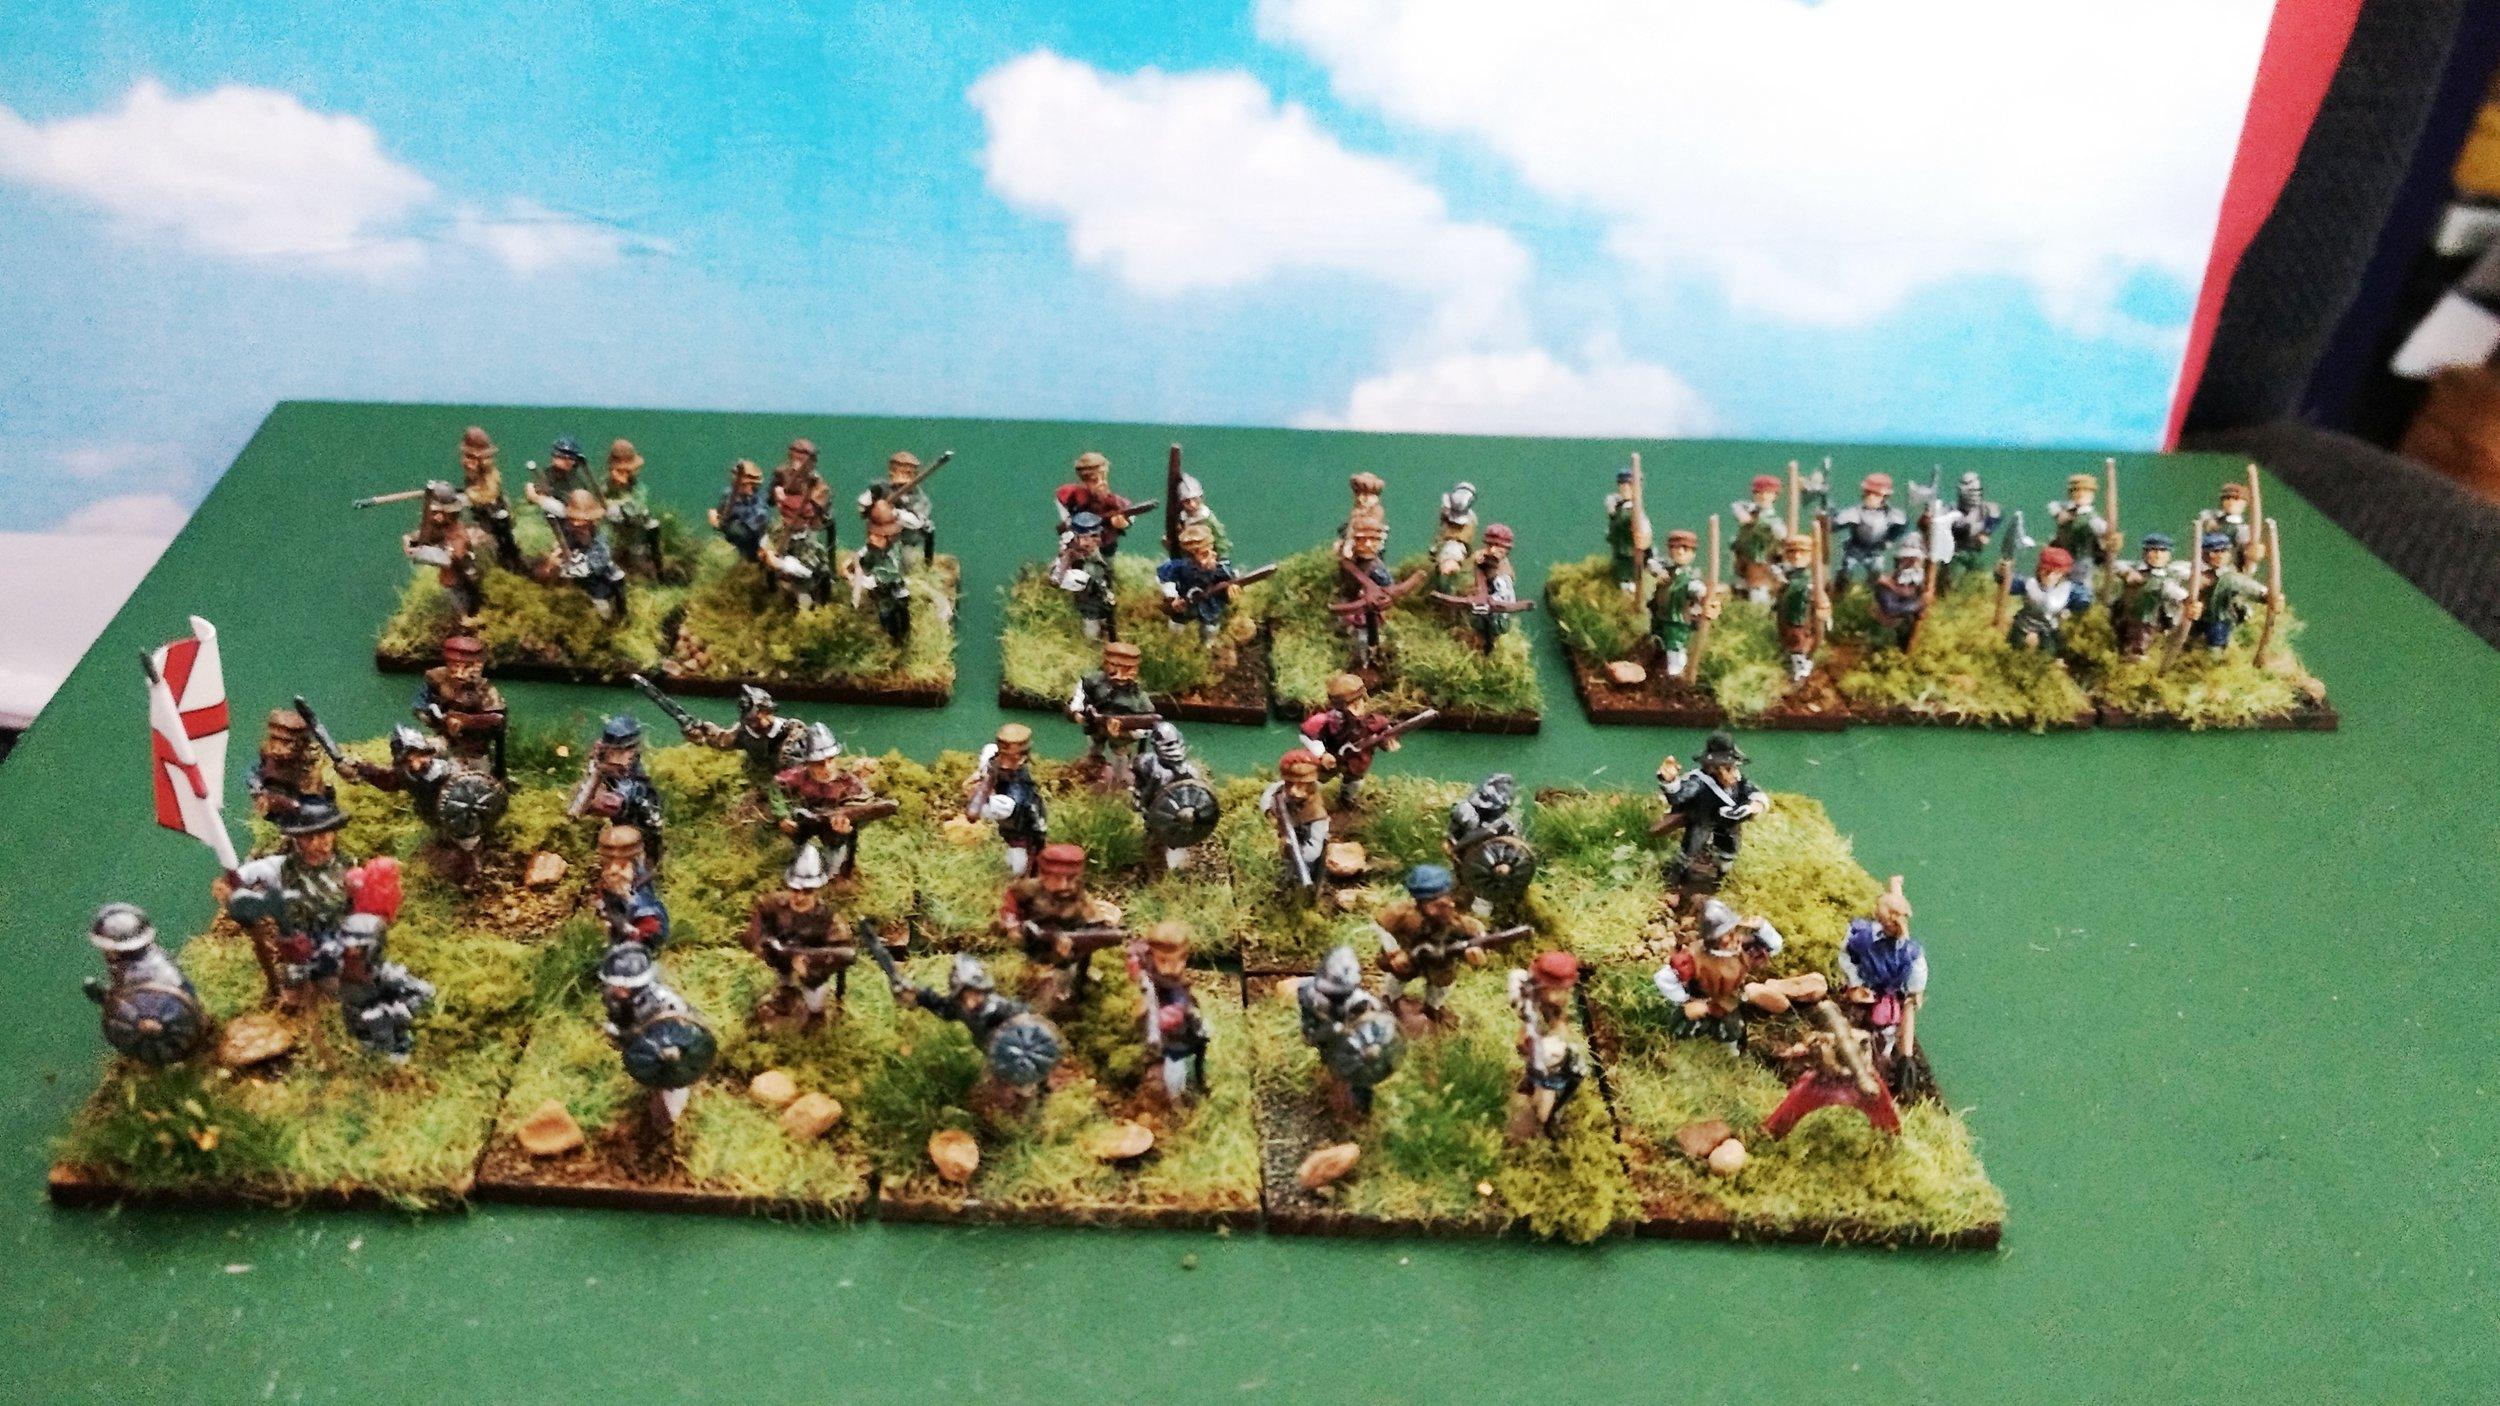 Mr Helliwell's Tudor colonials